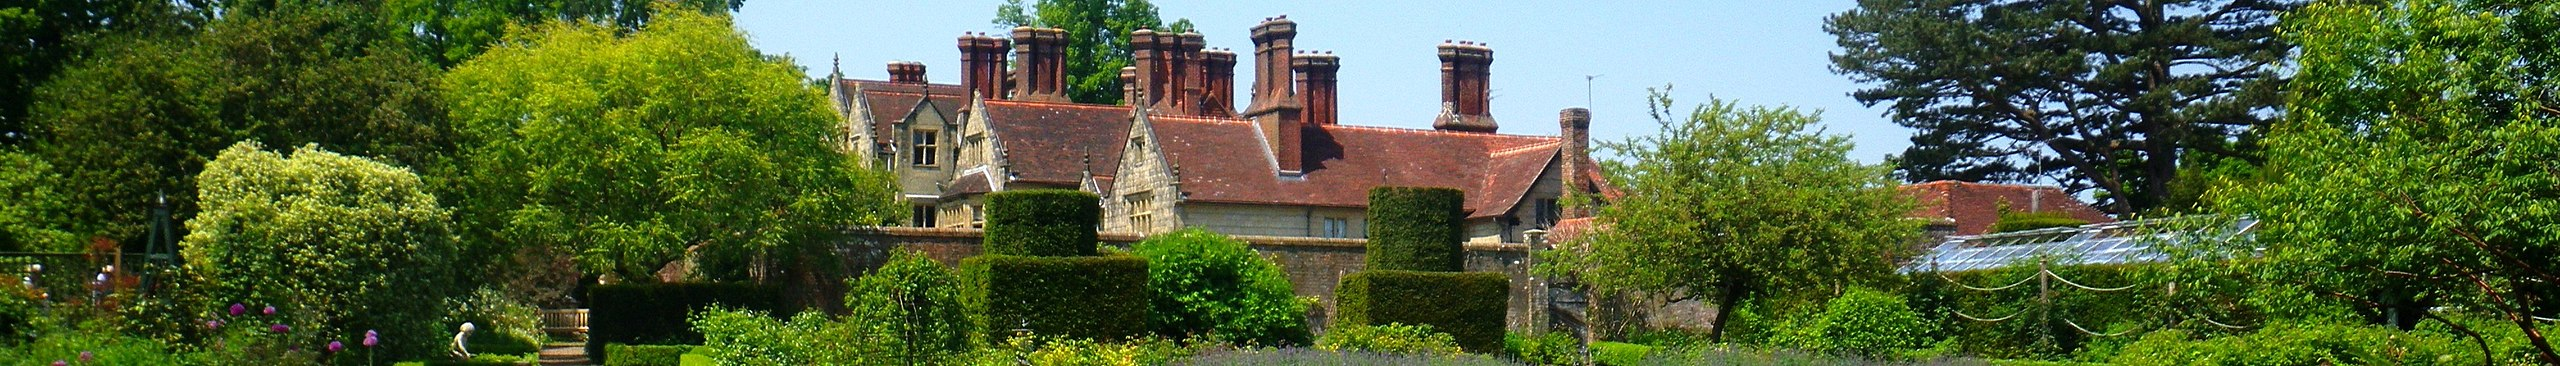 Haywards Heath Travel Guide At Wikivoyage